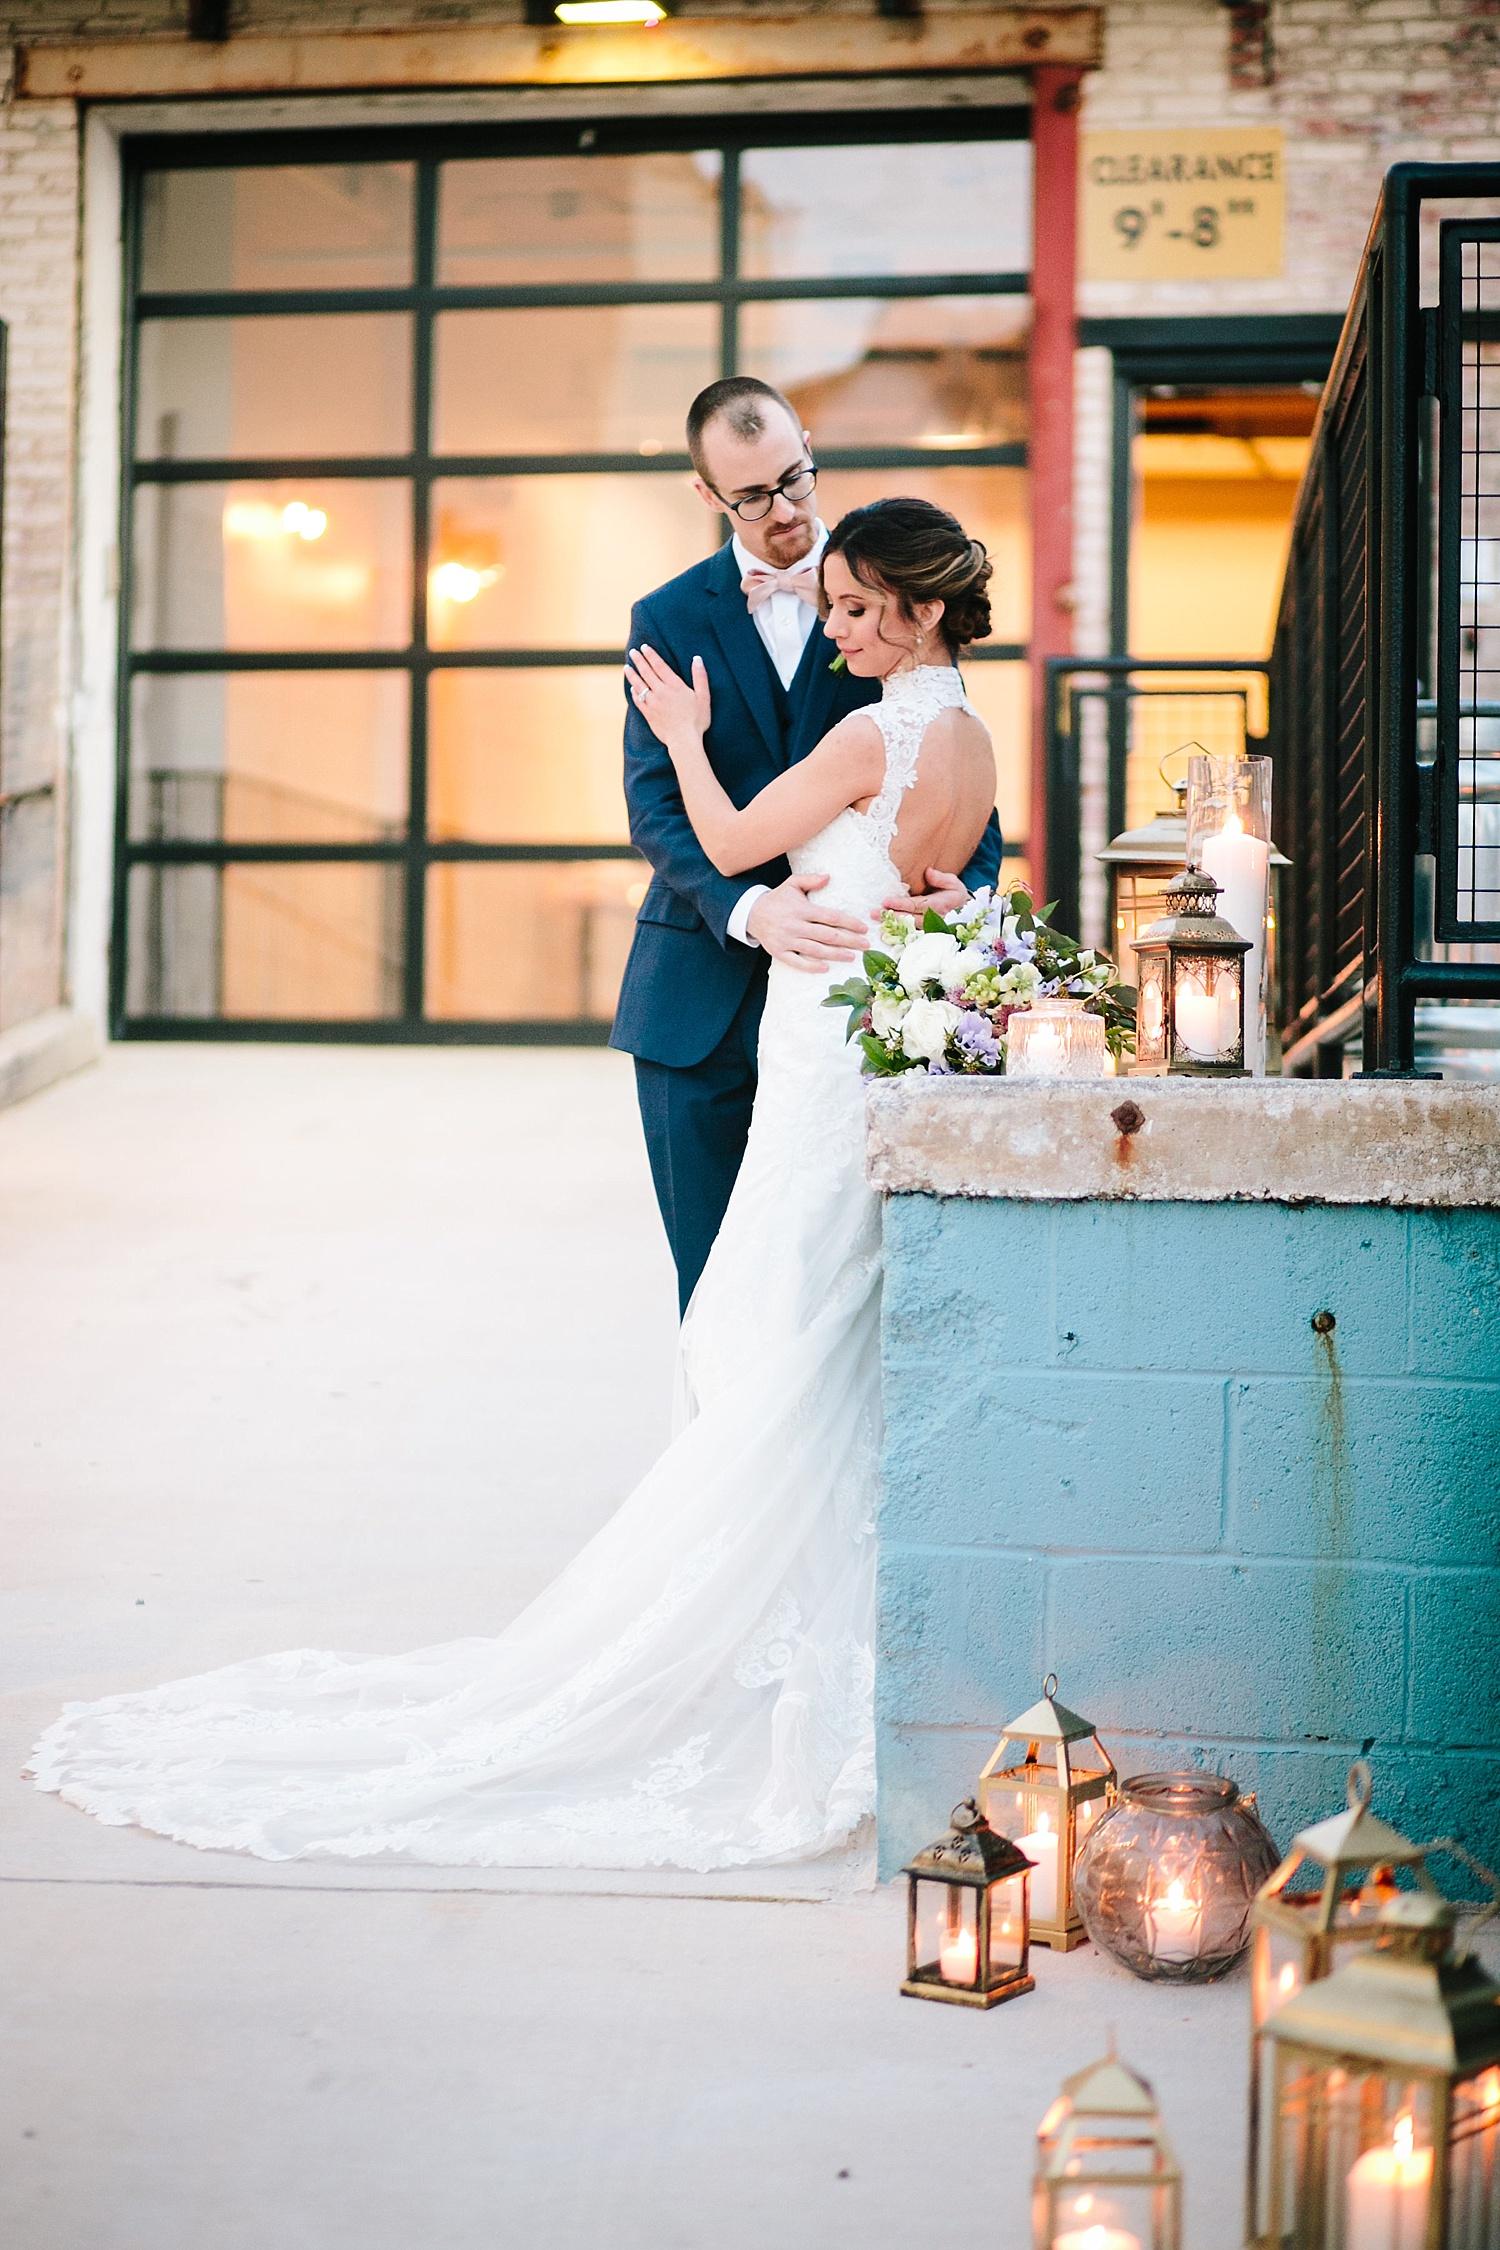 samanthaandrew_acceleratorspace_baltimore_maryland_loyola_wedding_image112.jpg